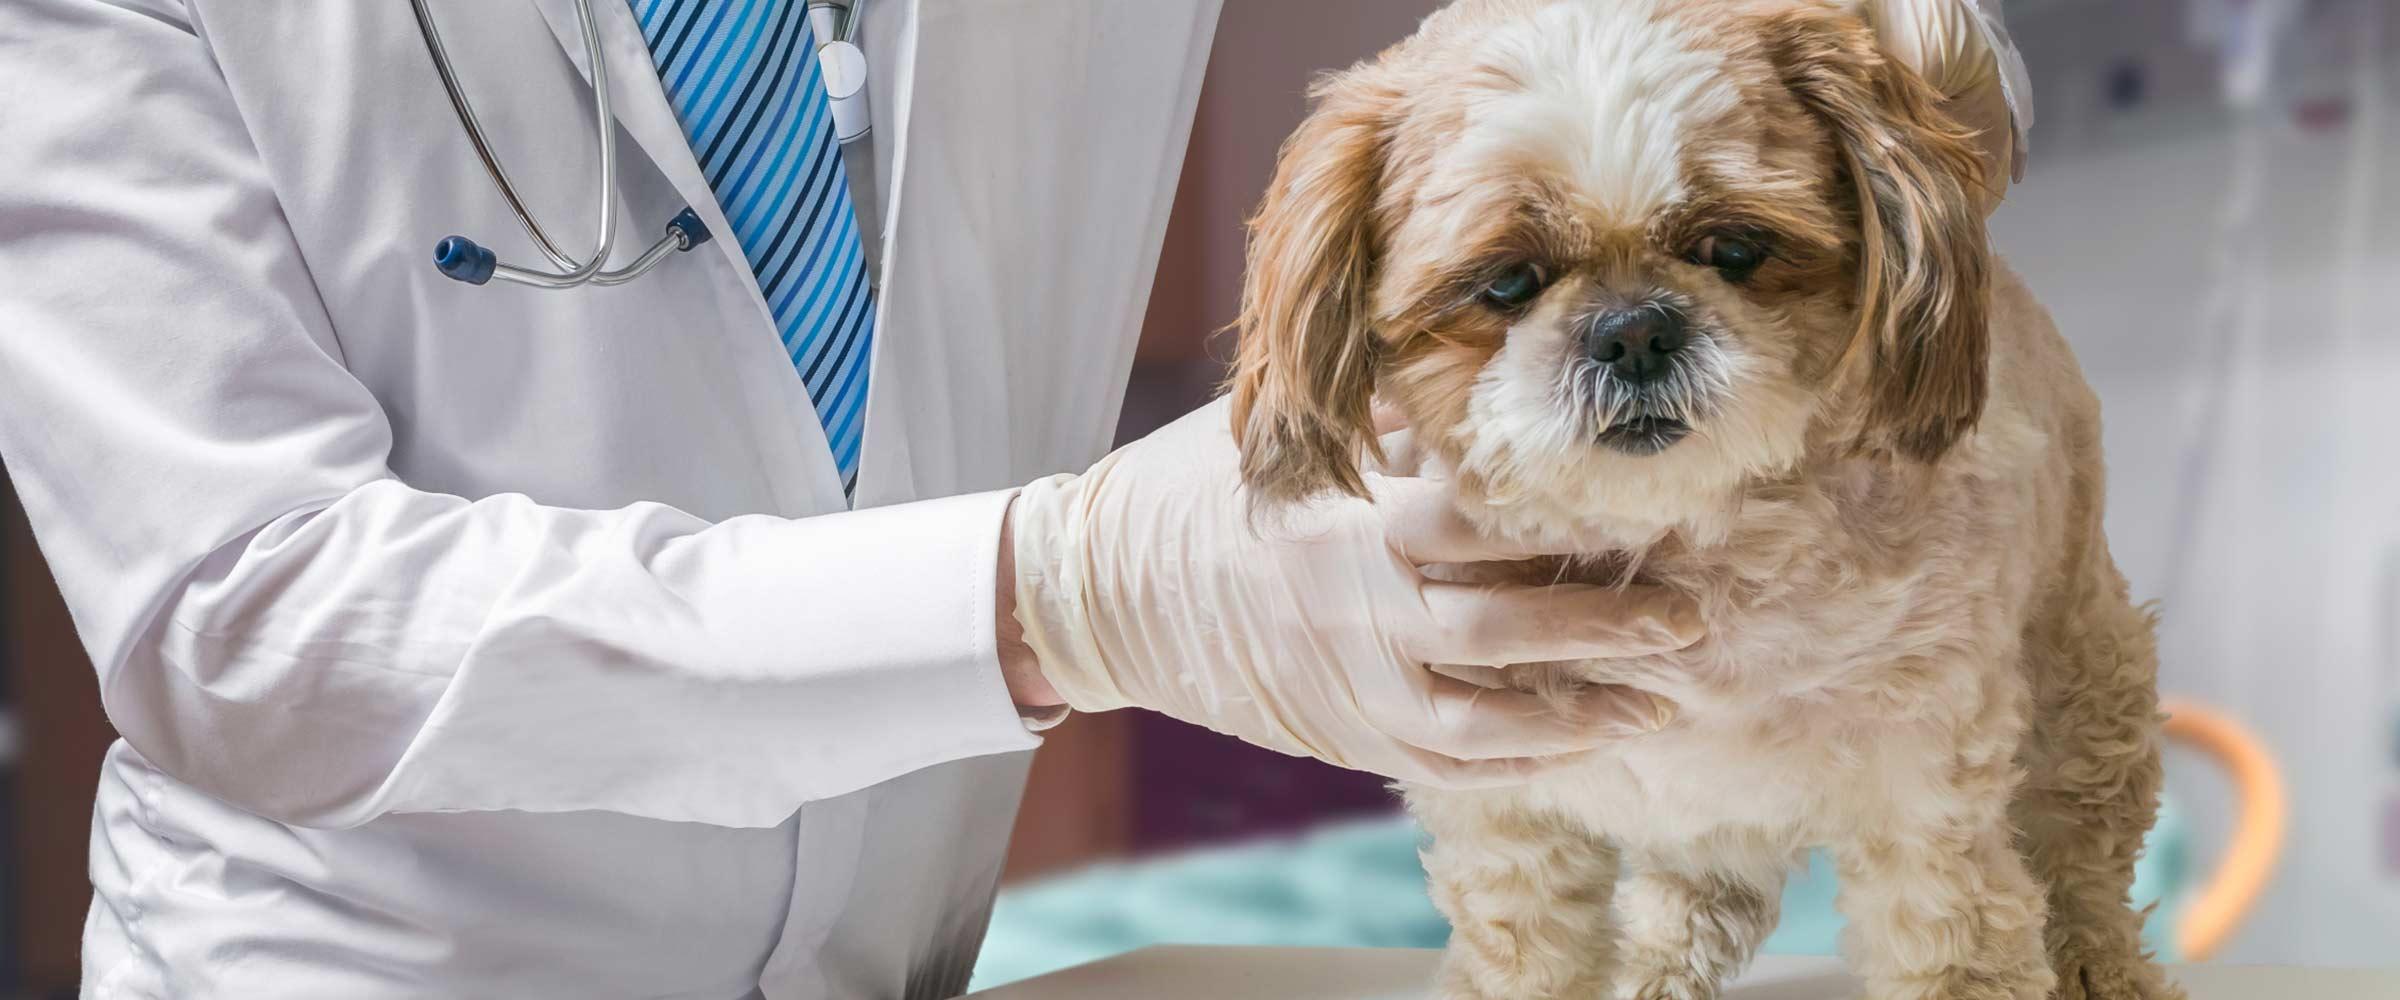 morphettville veterinary clinic little puppy gets the treatment